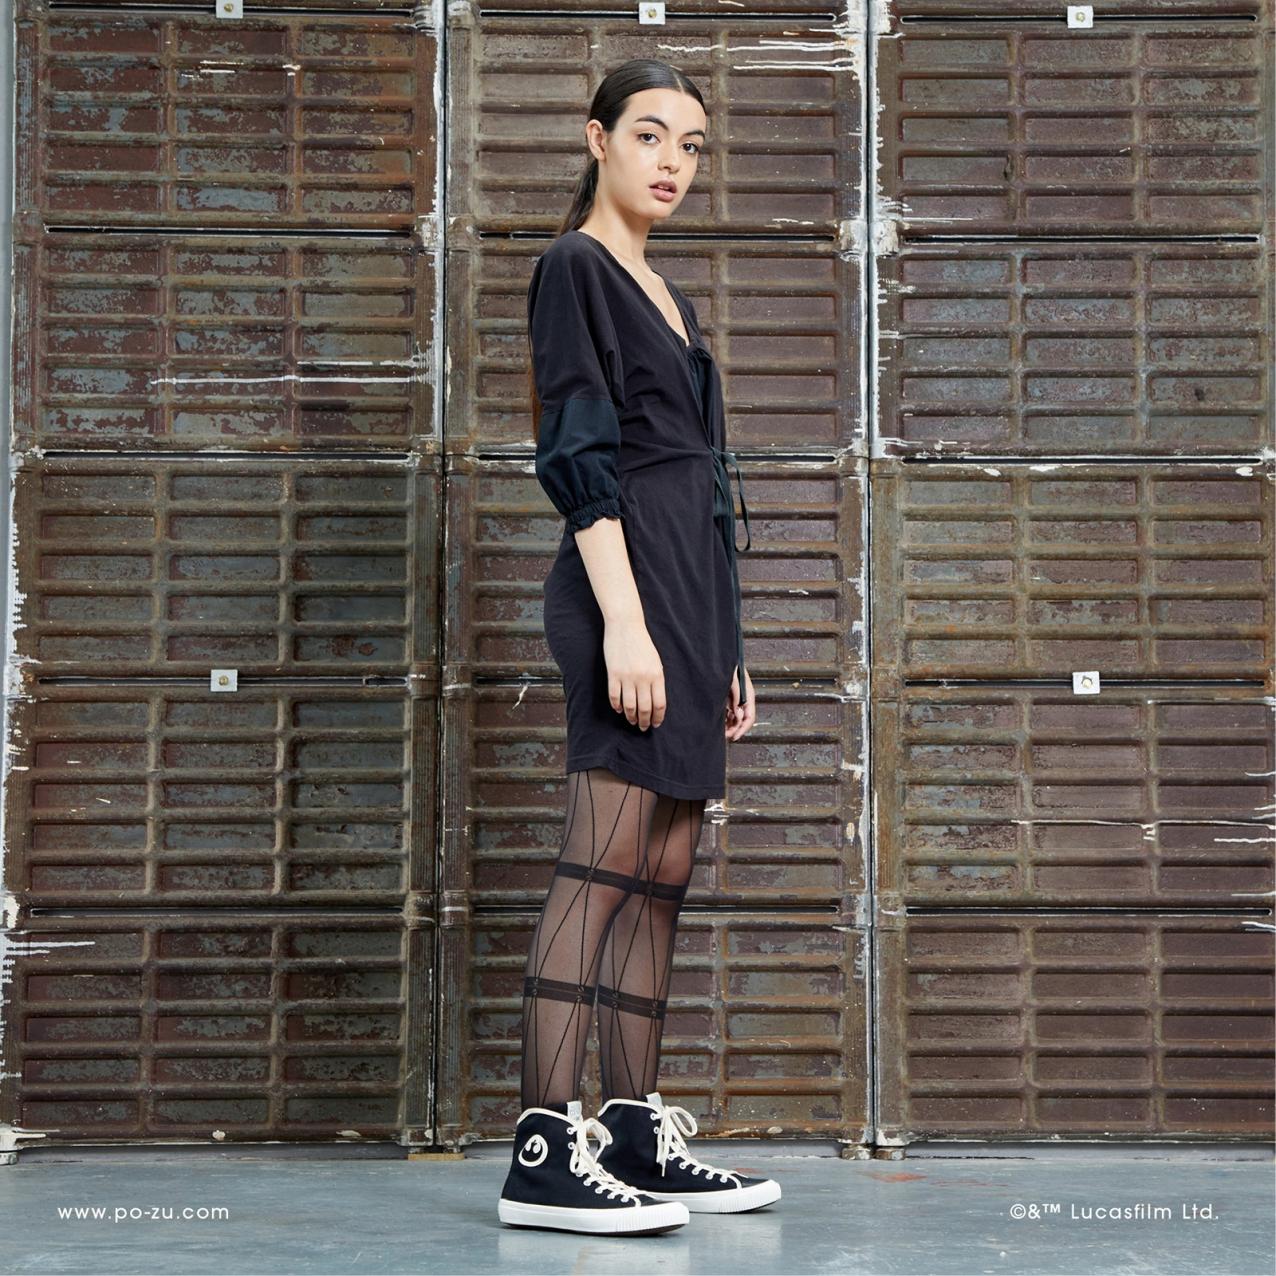 Po-Zu_Rebel_sneakers-13